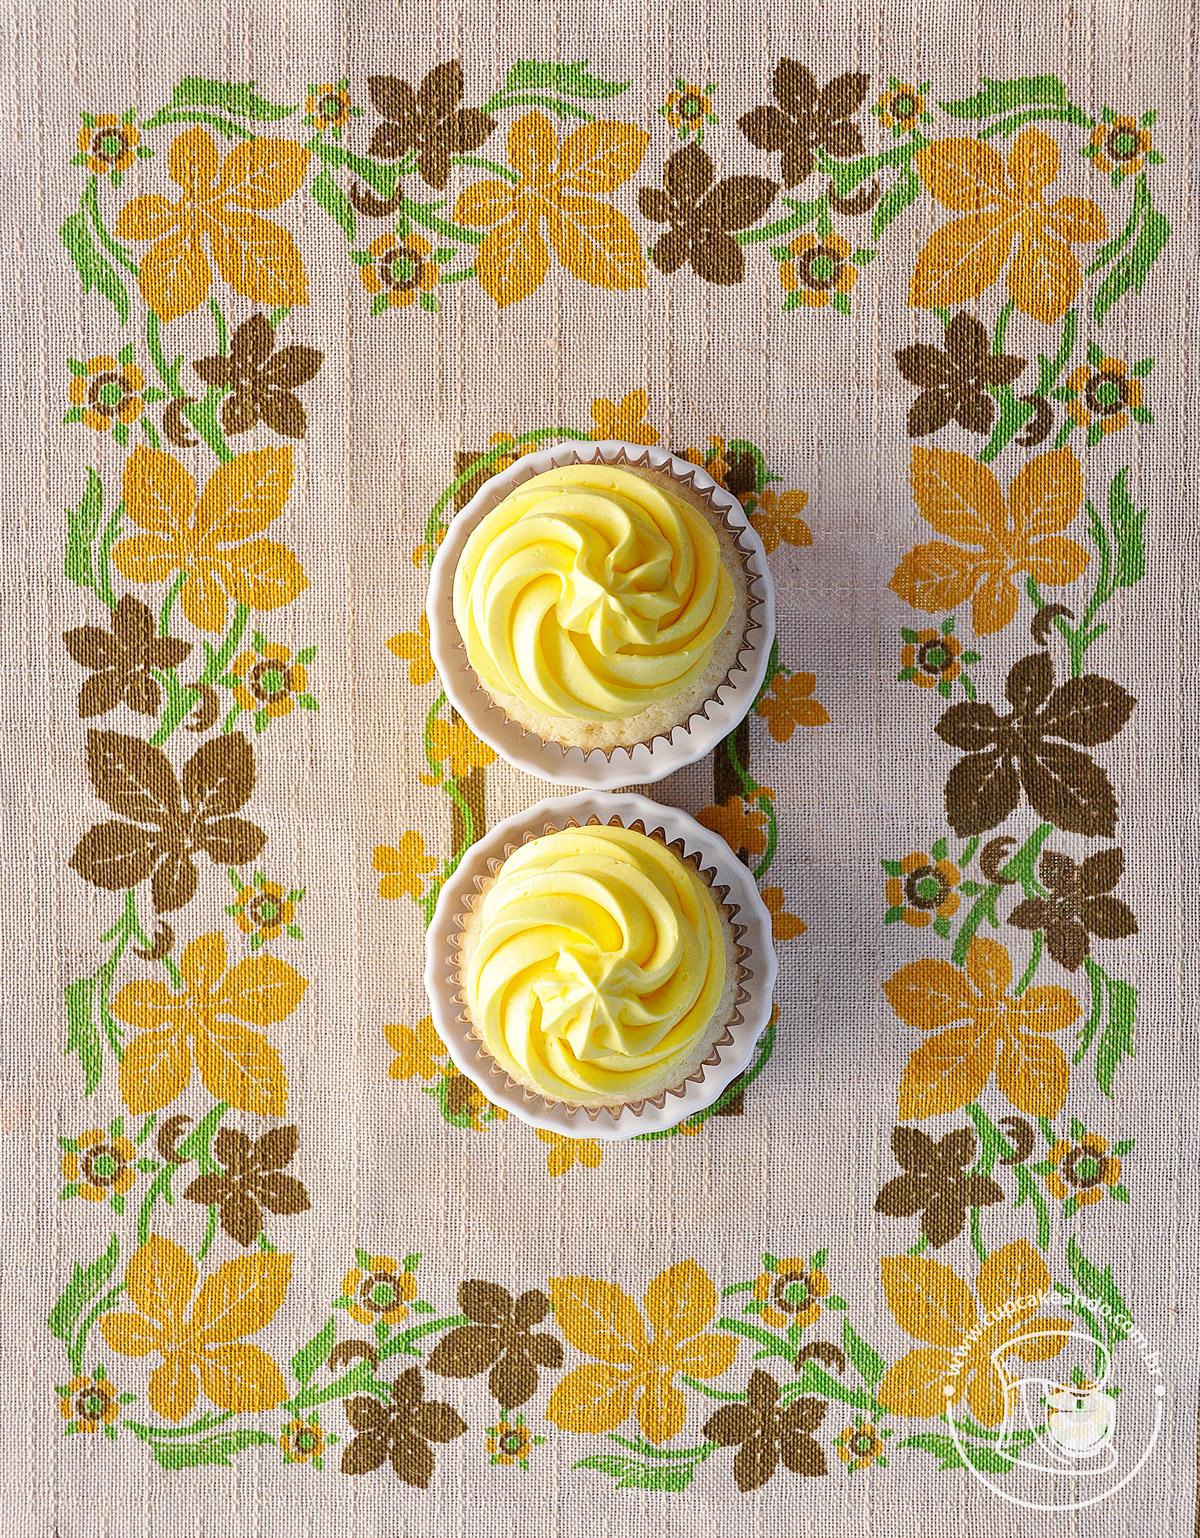 Buttercream de merengue italiano, o famoso IMBC.